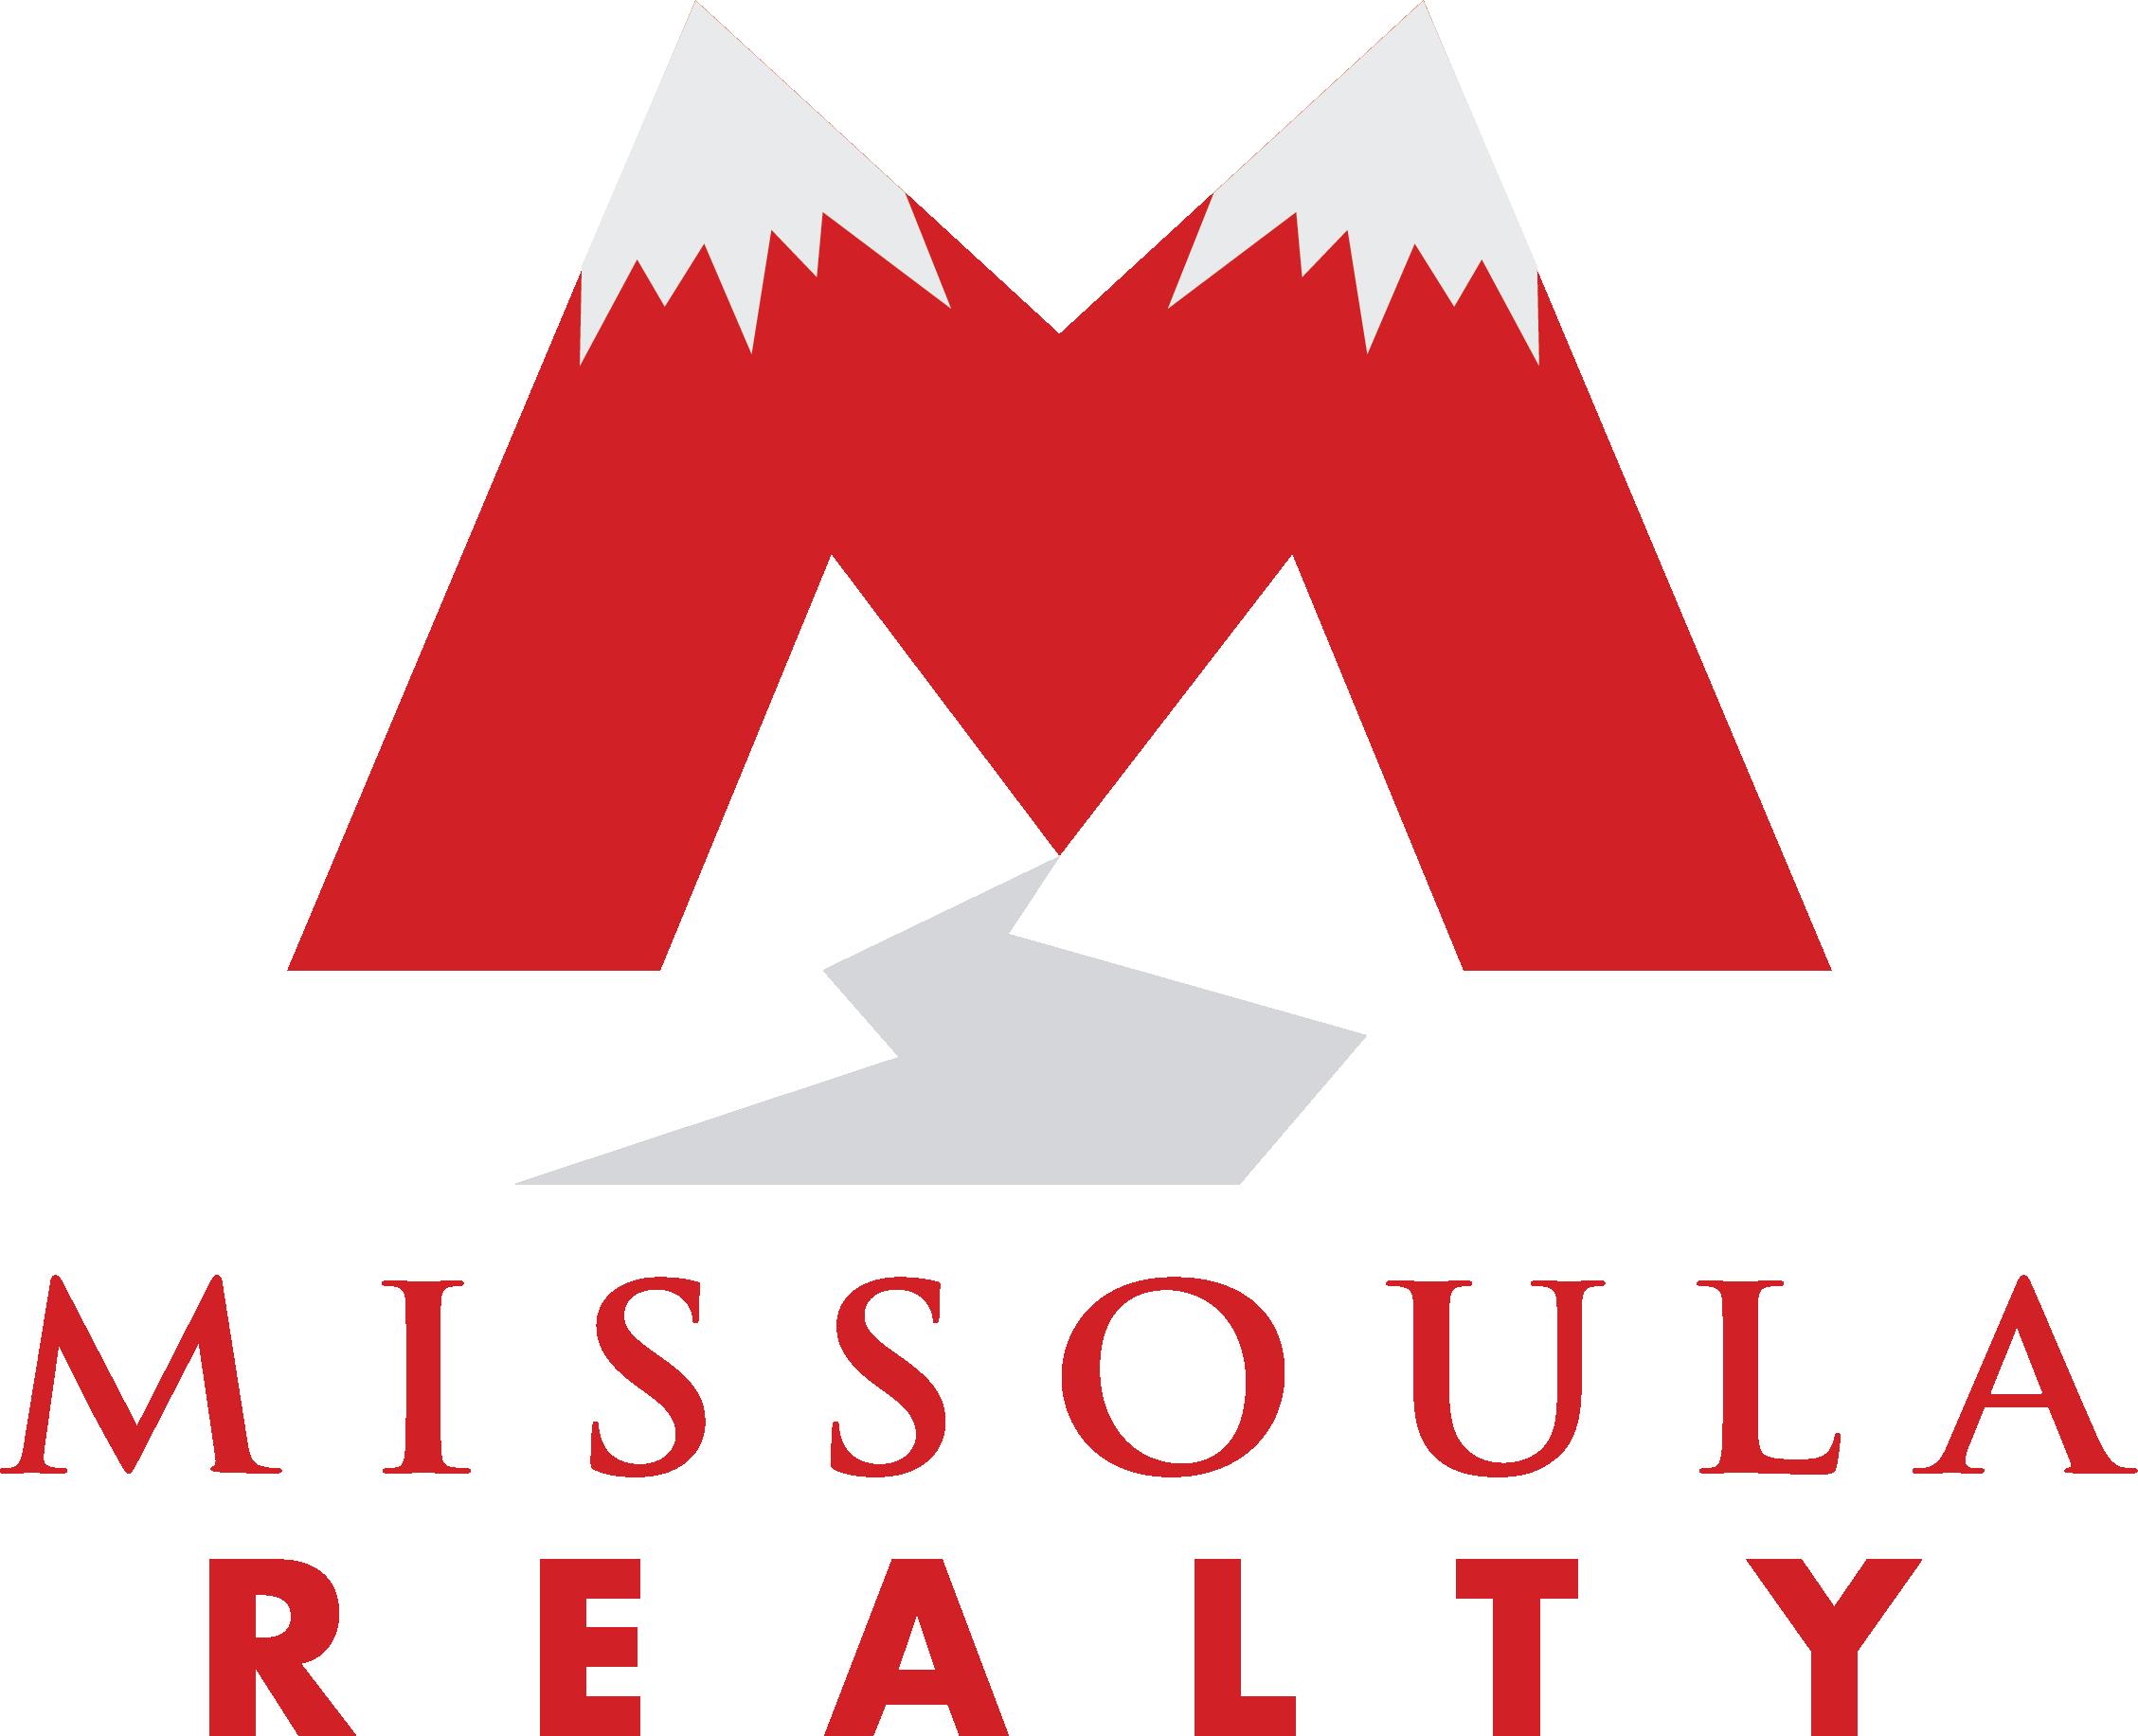 Missoula Realty